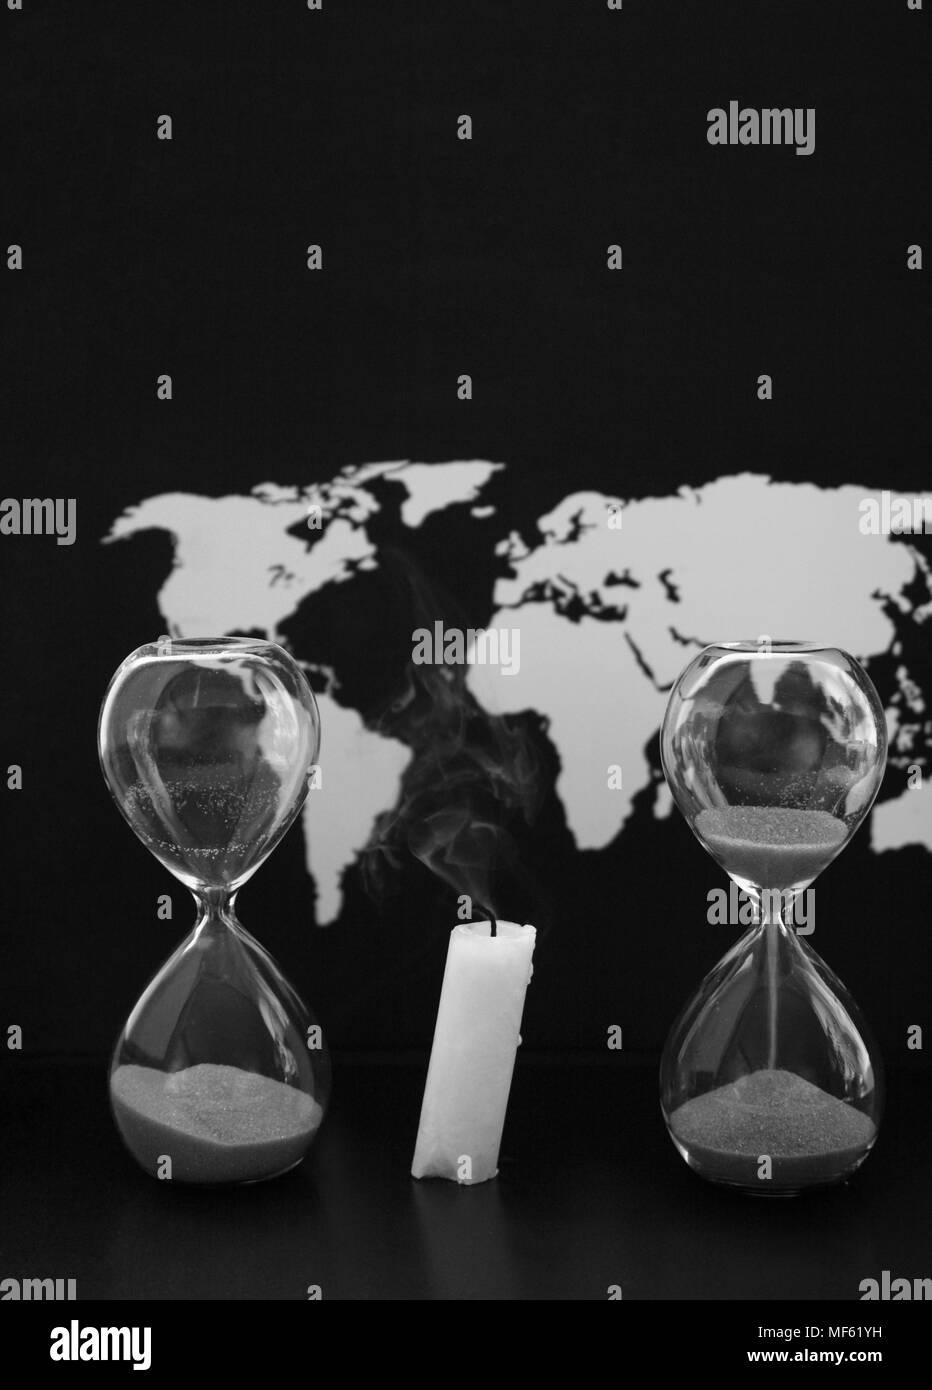 Monochrome image, world map, sandglasses and burnt candle, black background - Stock Image